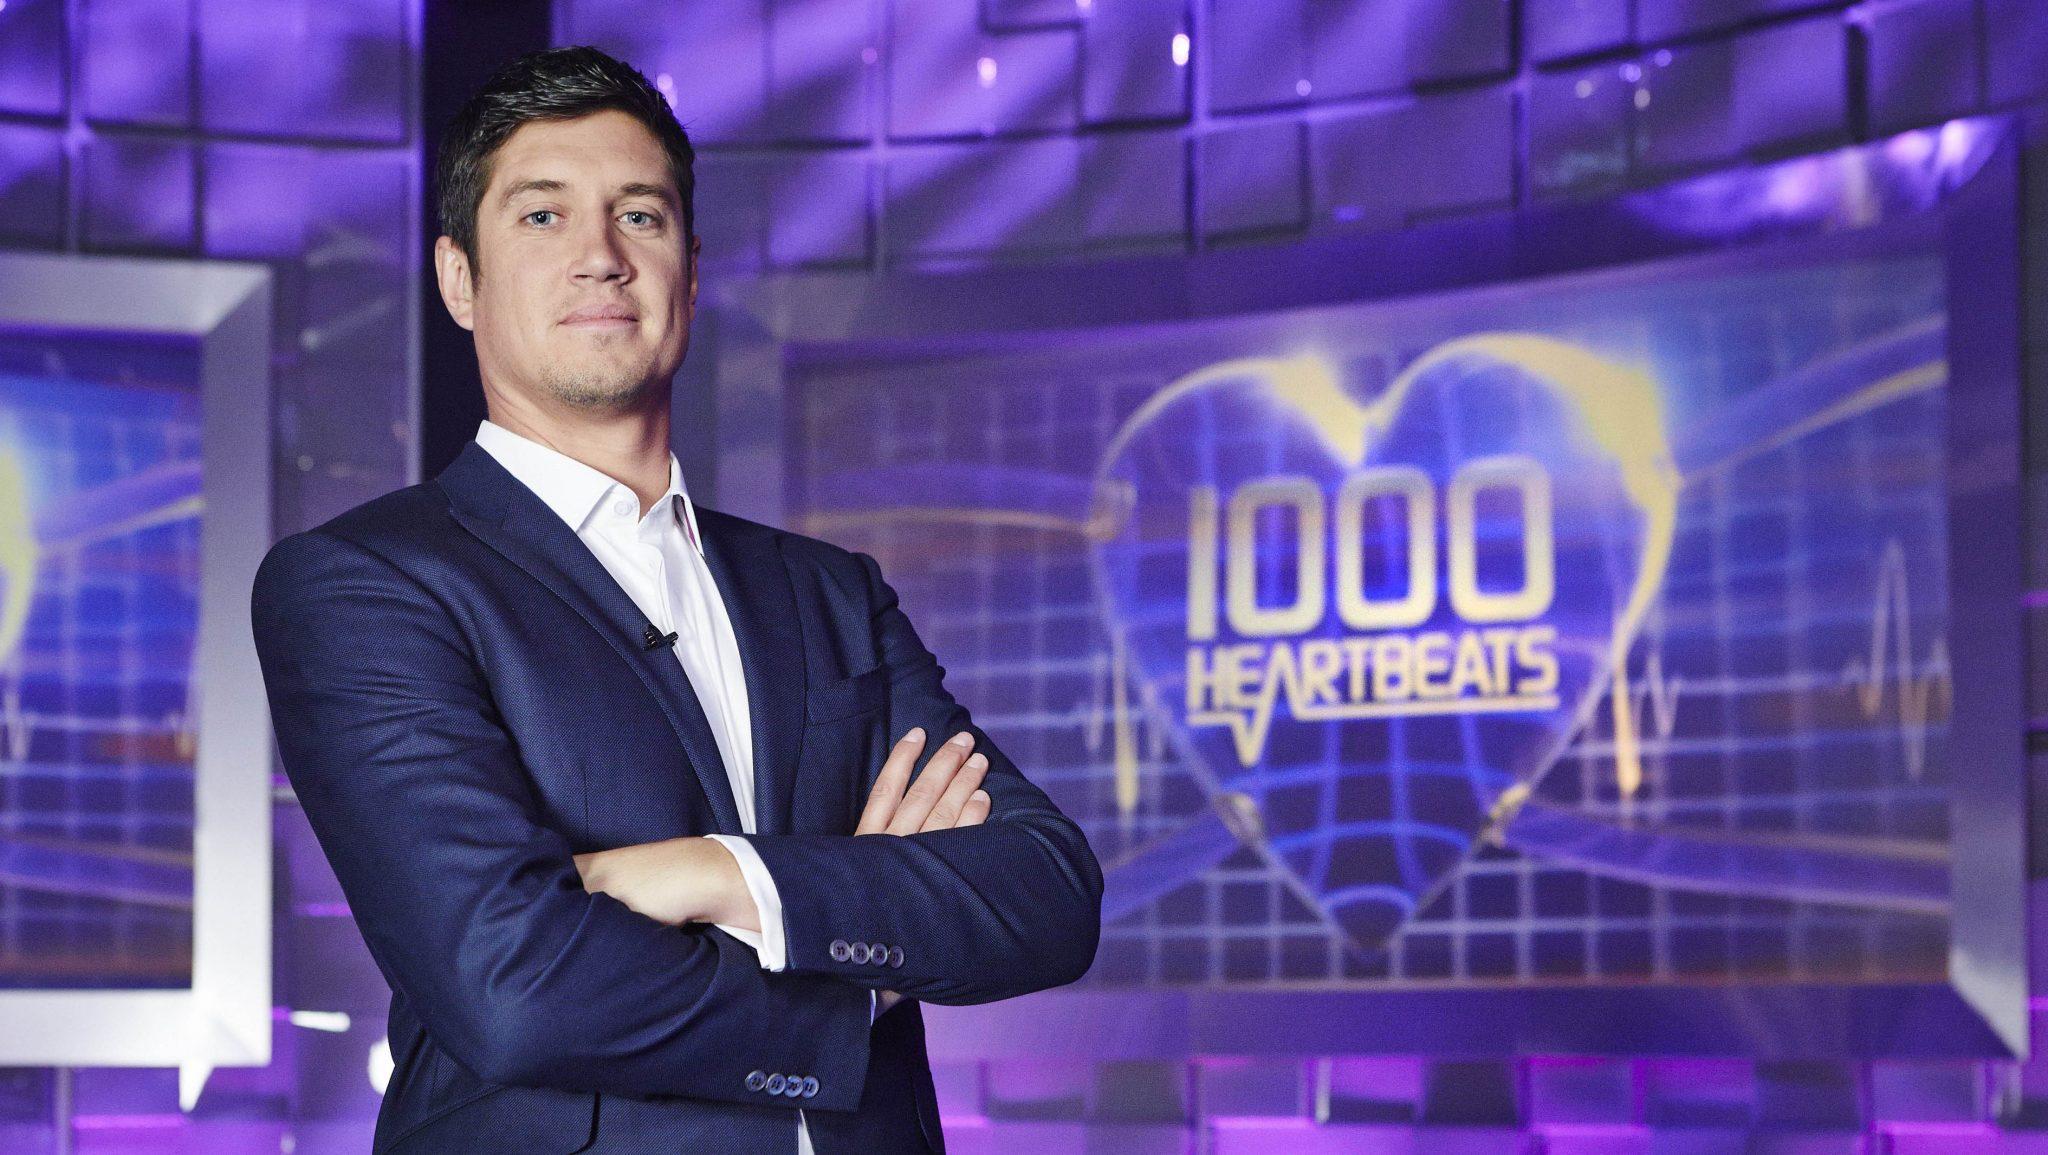 1000 HEARTBEATS ITV